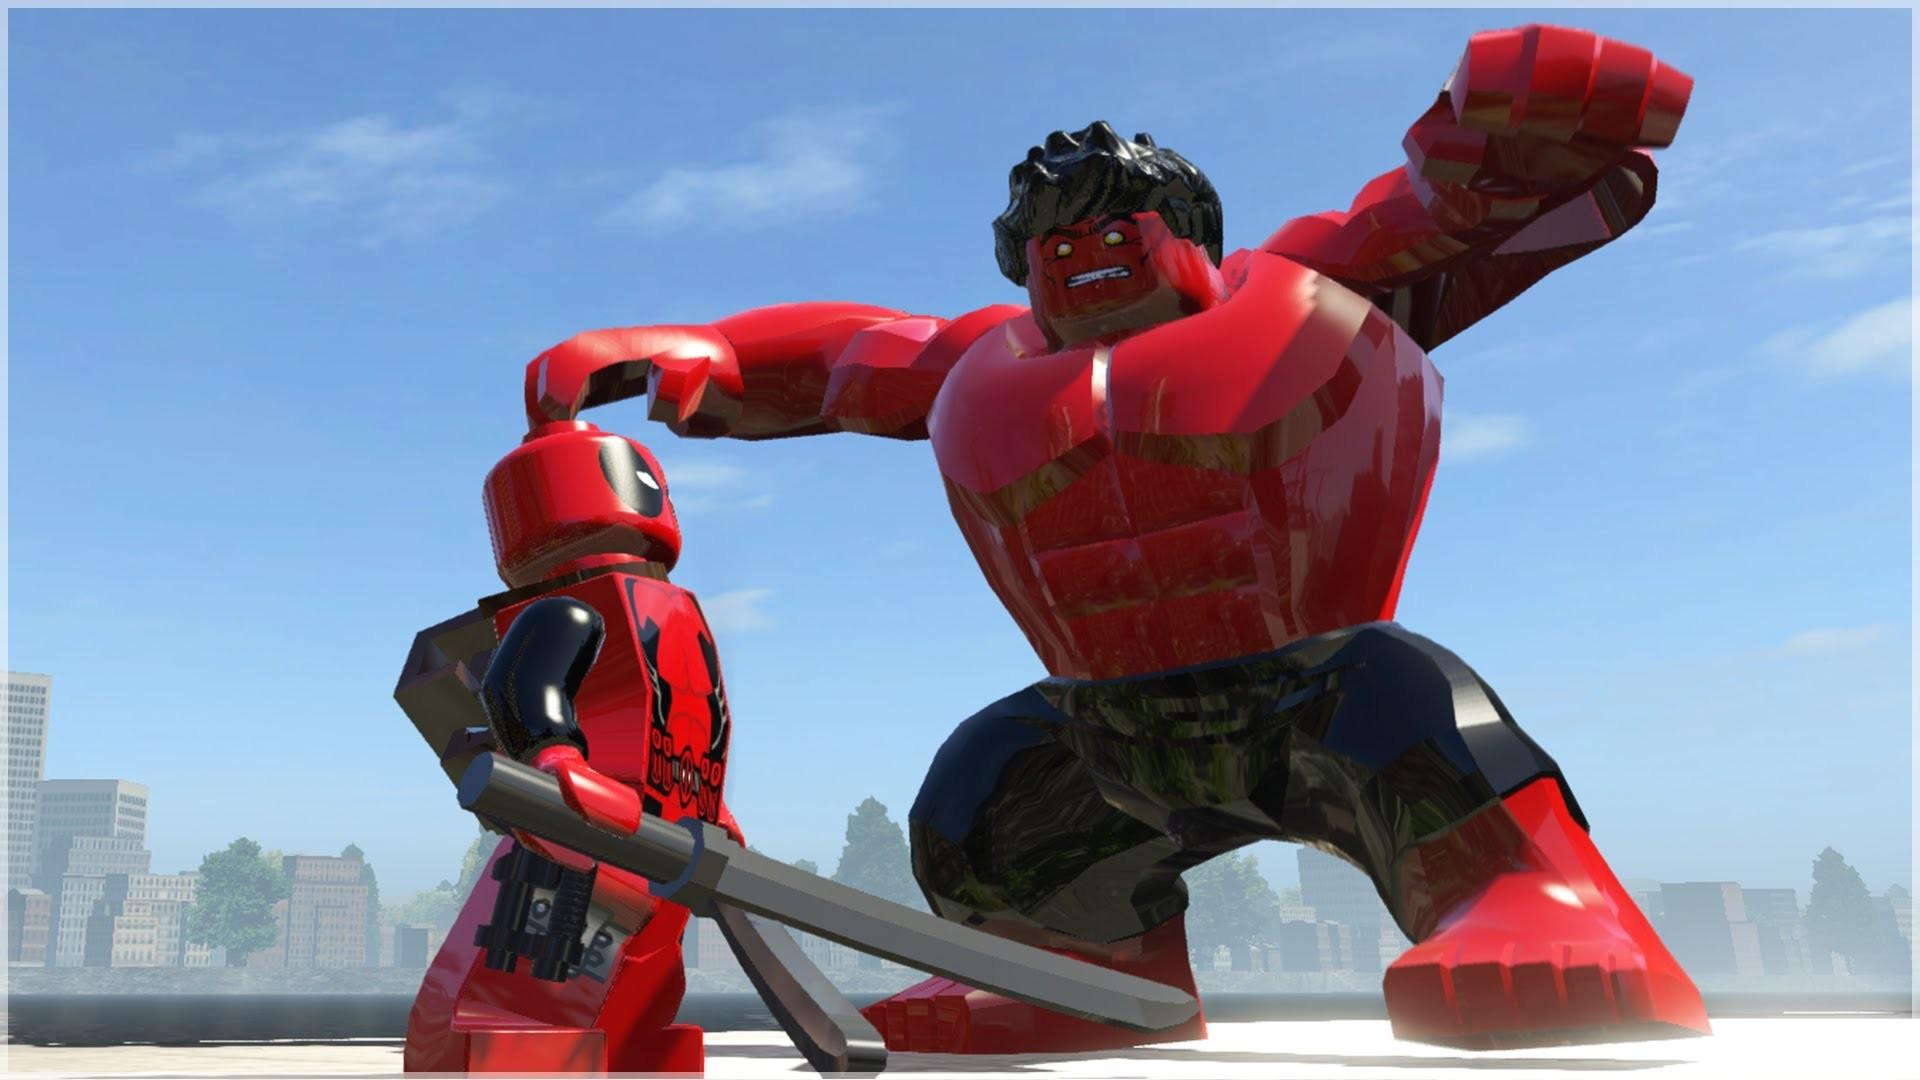 Res: 1920x1080, Red Hulk Wallpaper